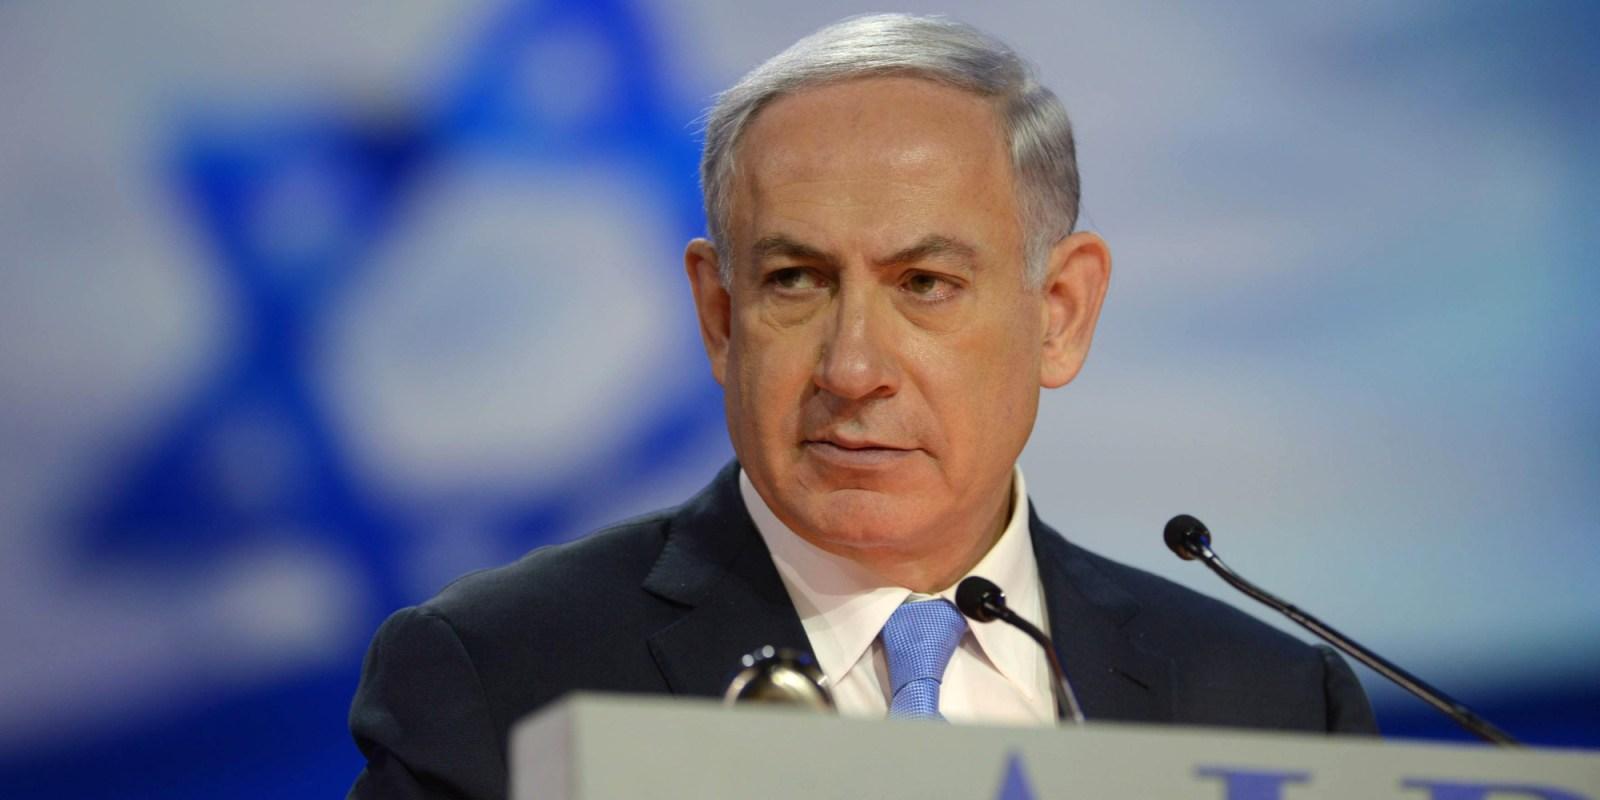 Netanyahu blasts Kerry's speech